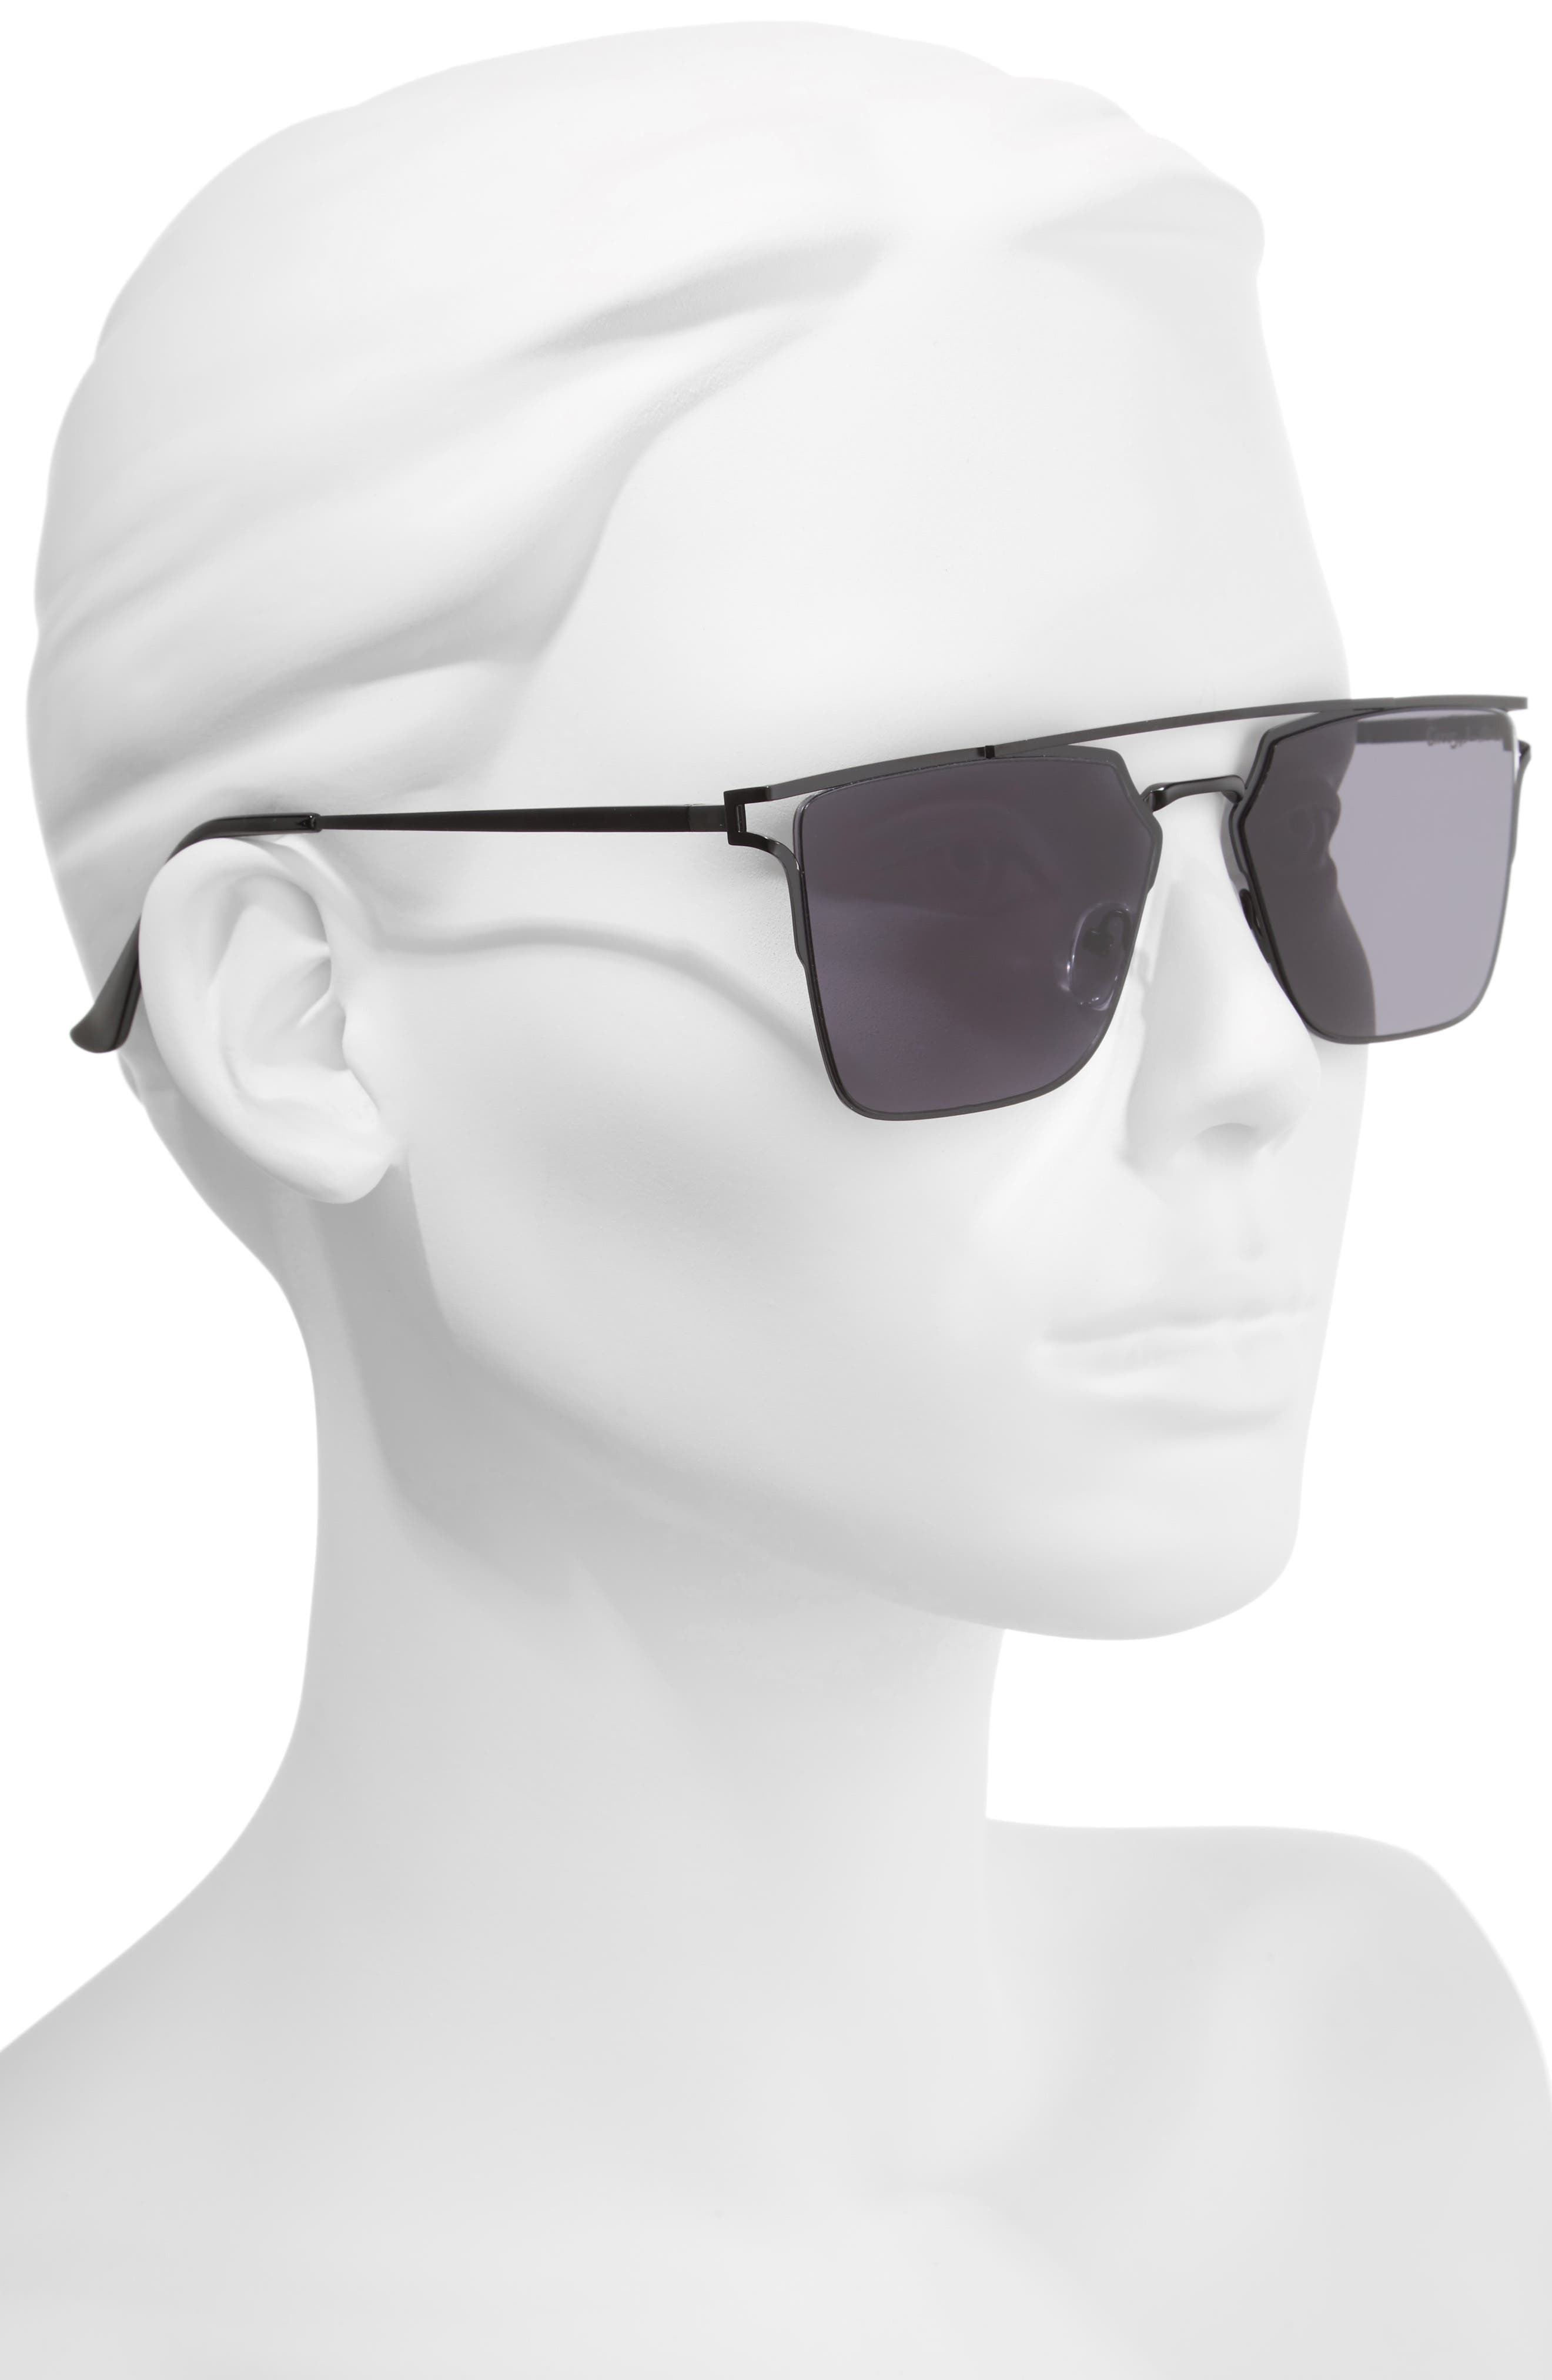 56mm Flat Top Sunglasses,                             Alternate thumbnail 2, color,                             001